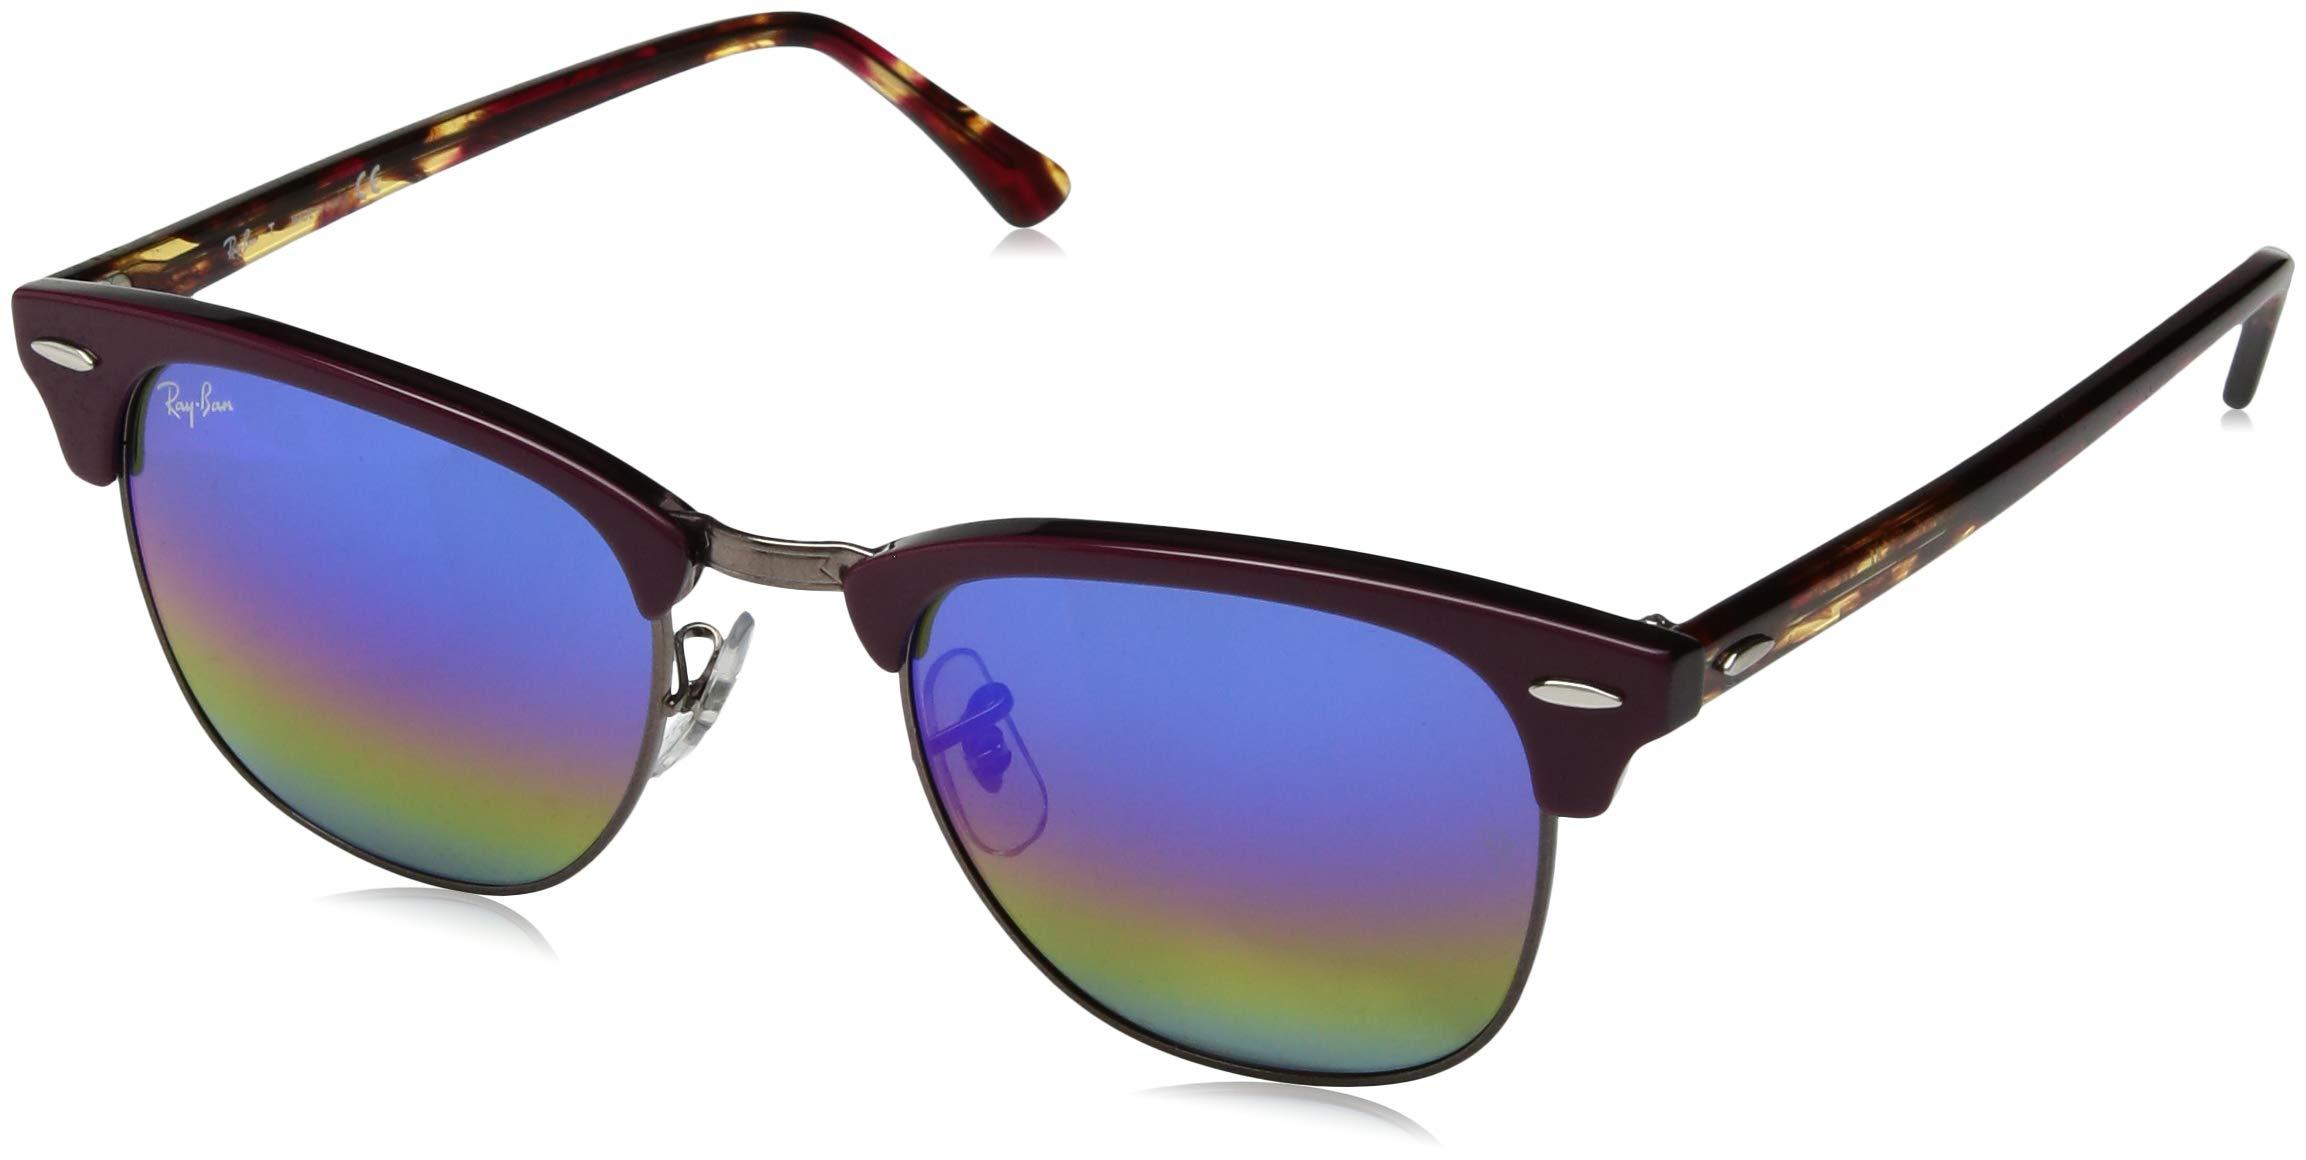 Ray-Ban RB3016 Clubmaster Square Sunglasses, Metallic Dark Bronze/Blue Rainbow Flash, 51 mm